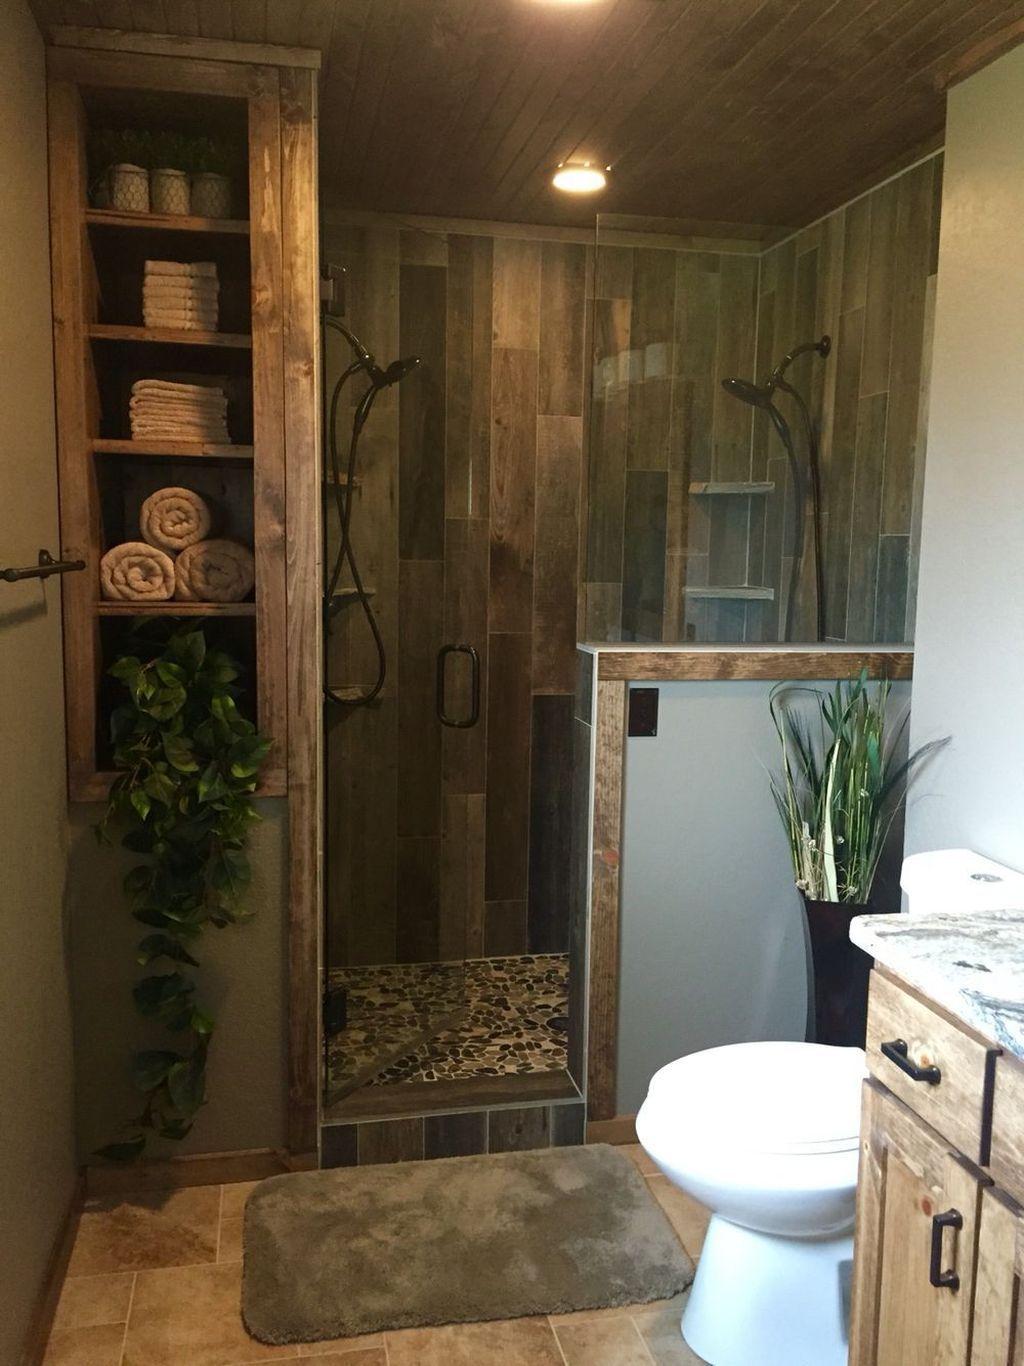 40 cool small master bathroom remodel ideas modern on amazing small bathroom designs and ideas id=37821